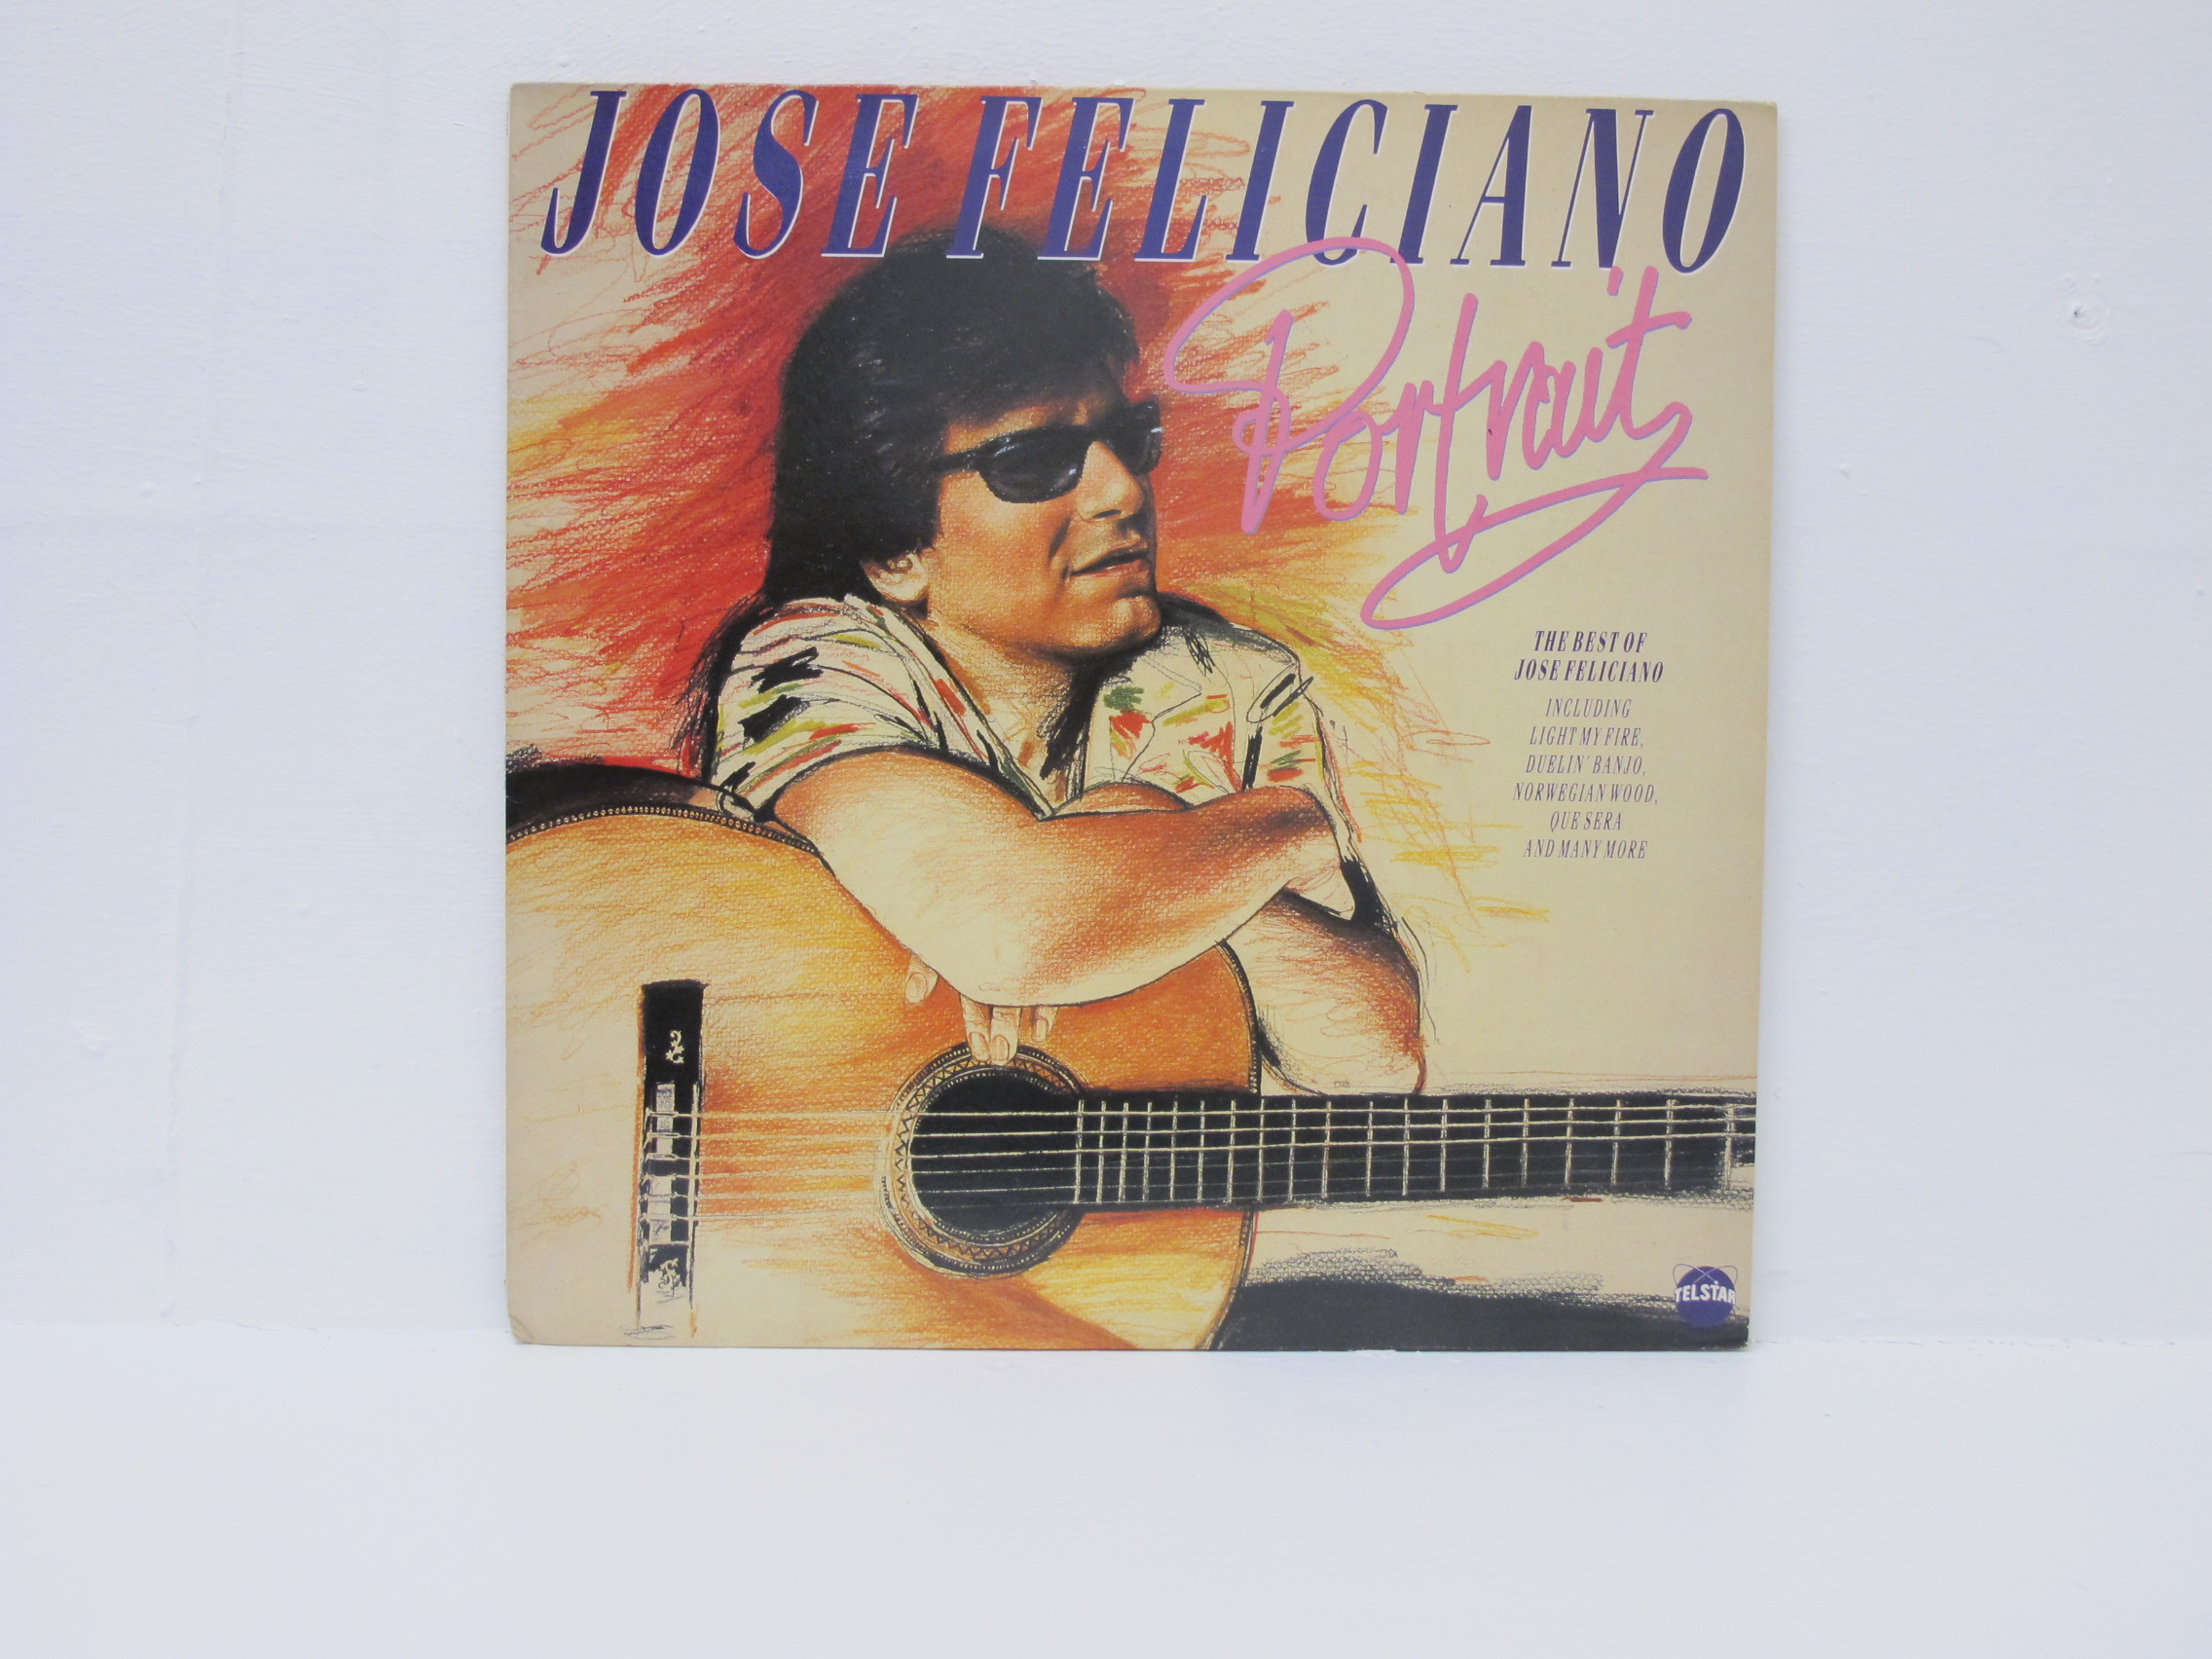 Jose Feliciano - Portrait